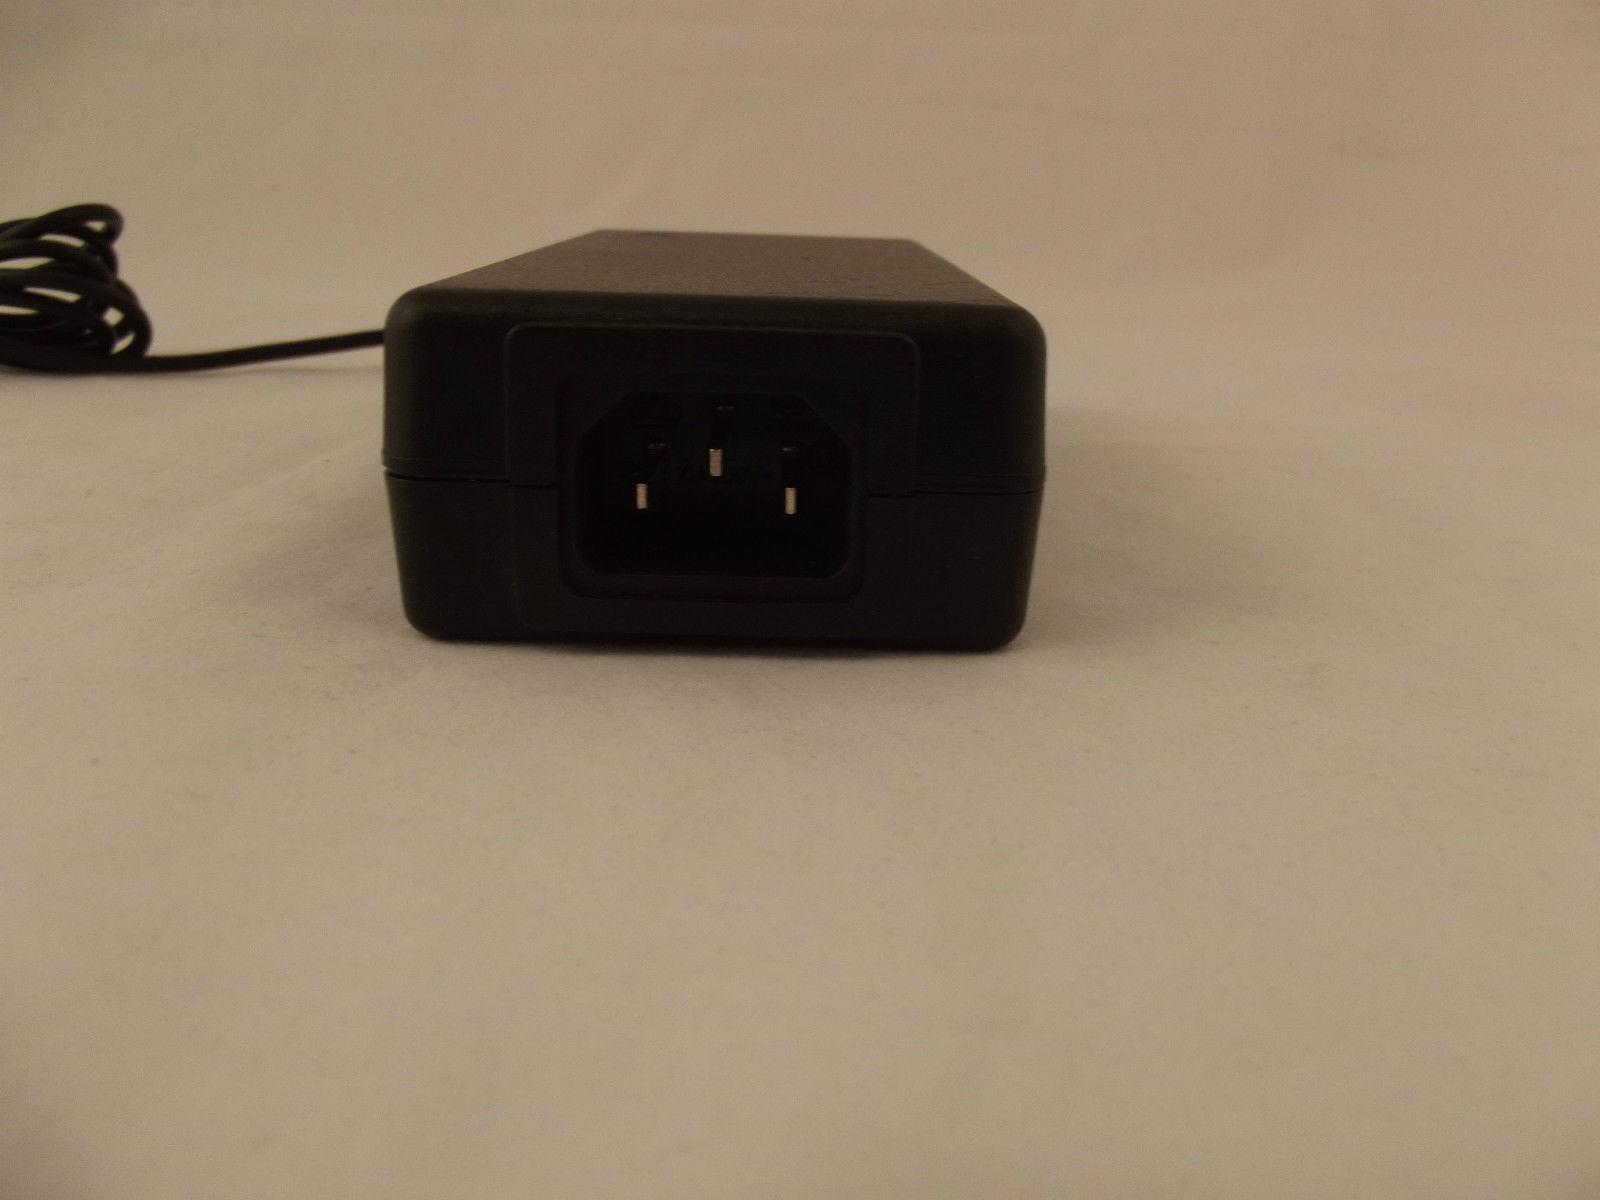 I-MAG SES49-120400-7 E90 Workstation LCD AC Adapter 12V 4A 23-3